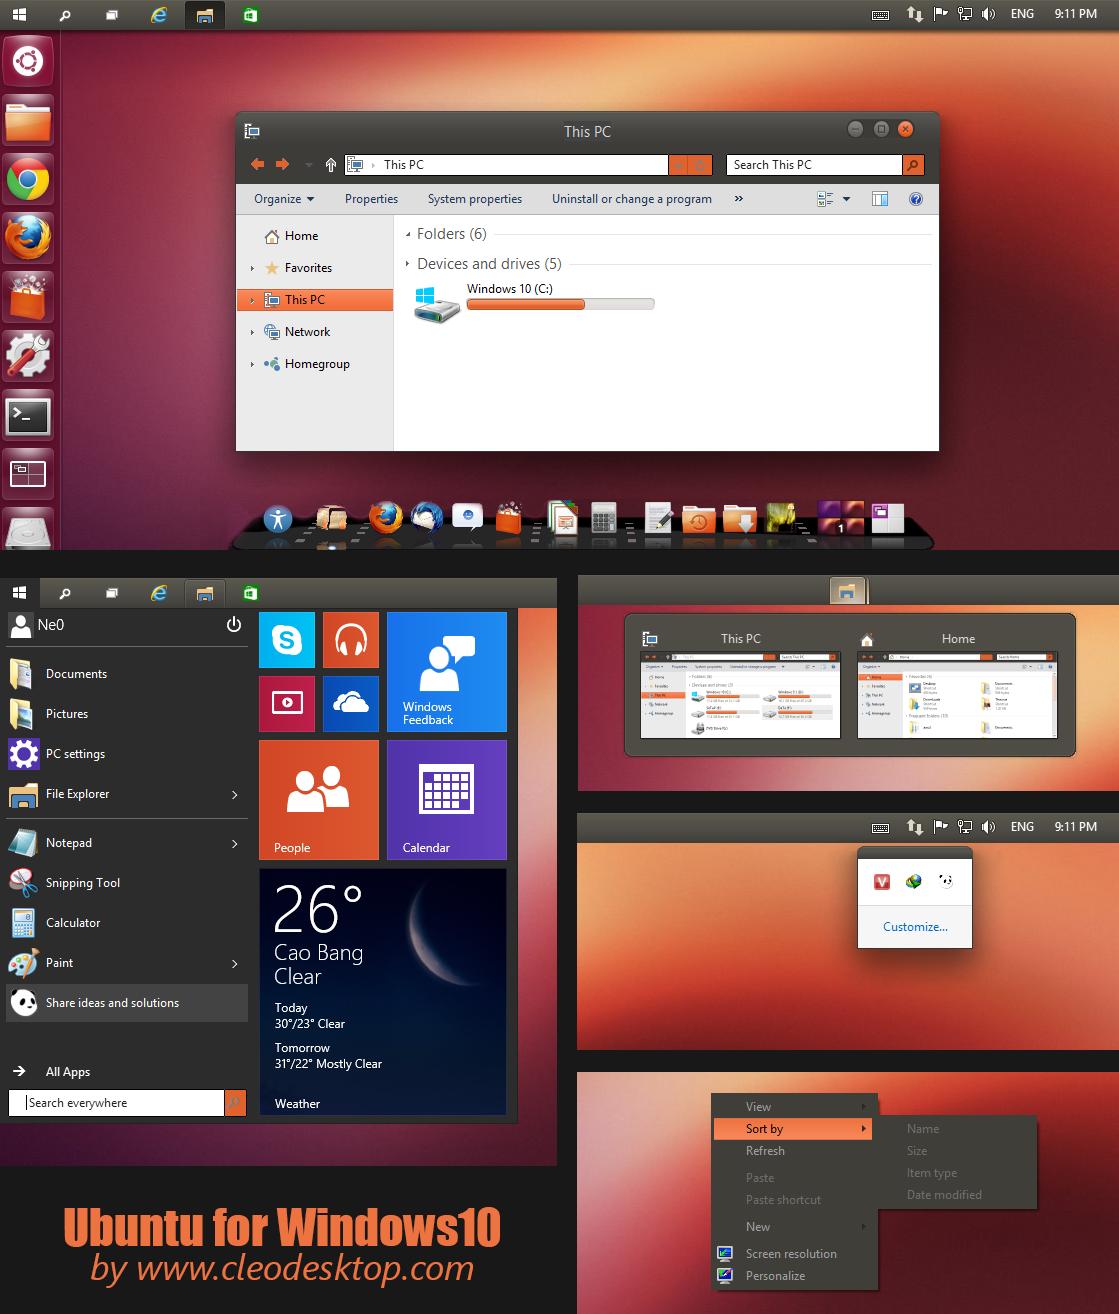 Ubuntu Theme Windows 10 Technical Preview By Cleodesktop